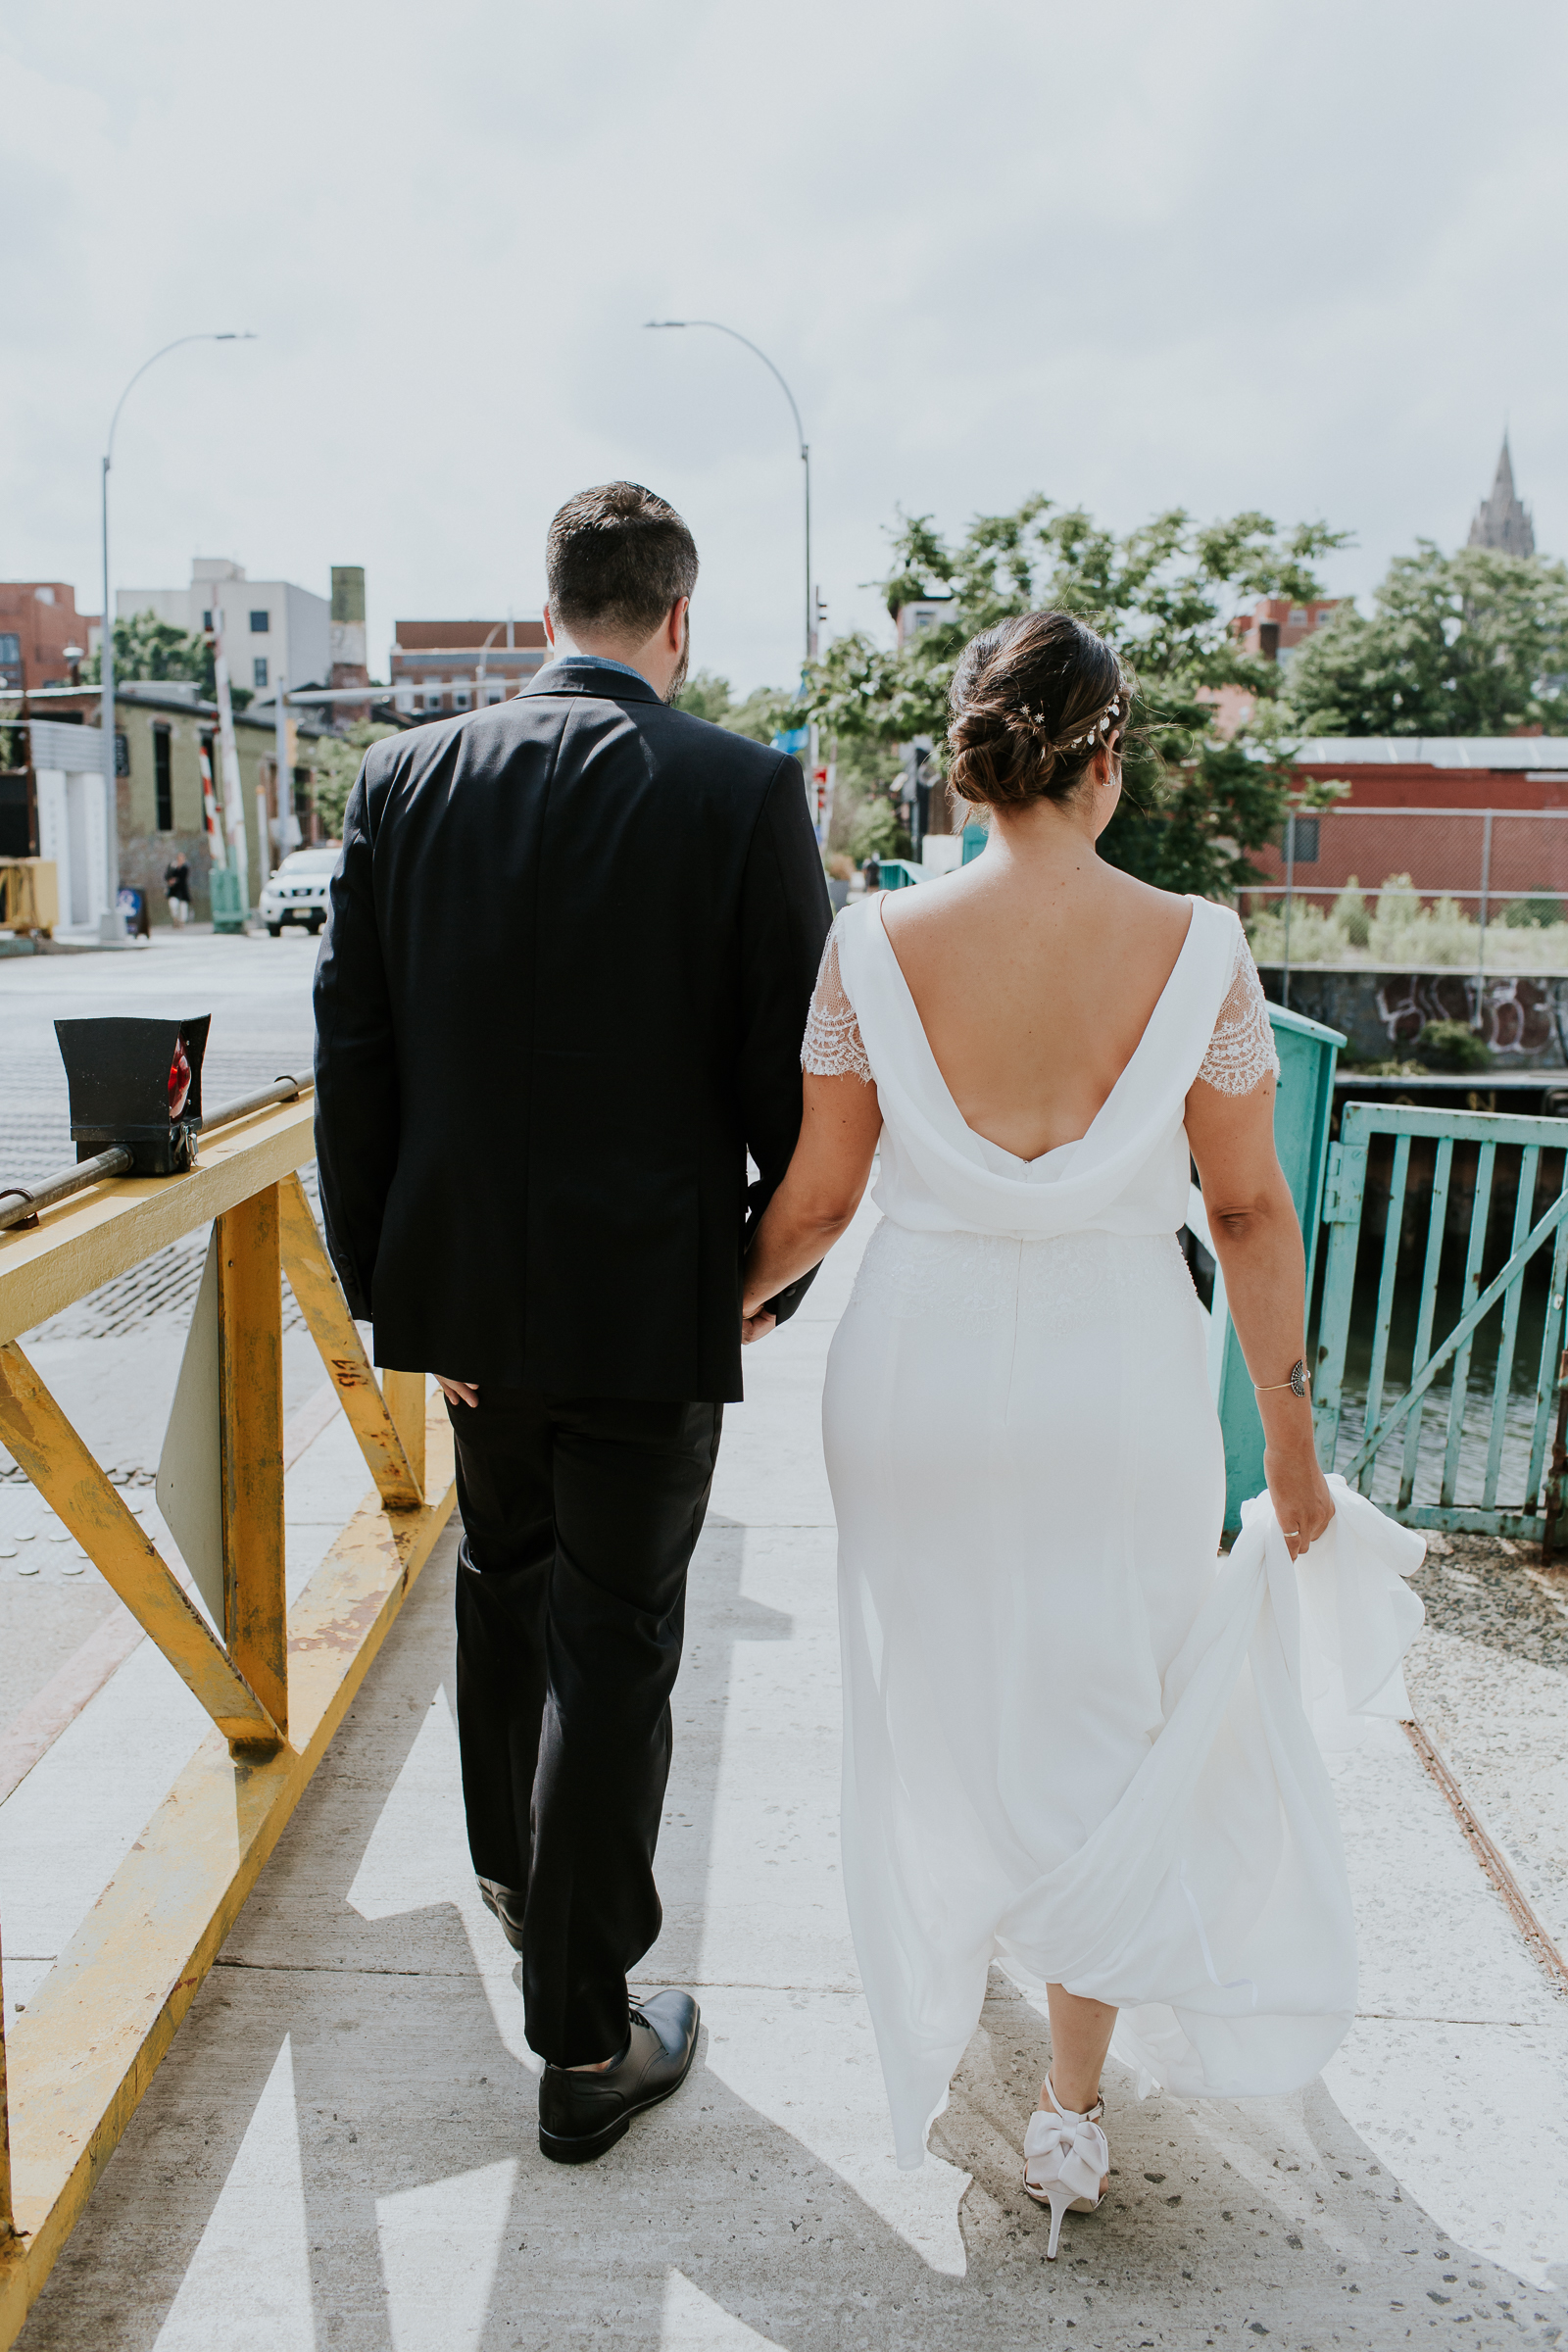 501-Union-Brooklyn-Fine-Art-Documentary-Wedding-Photographer-39.jpg